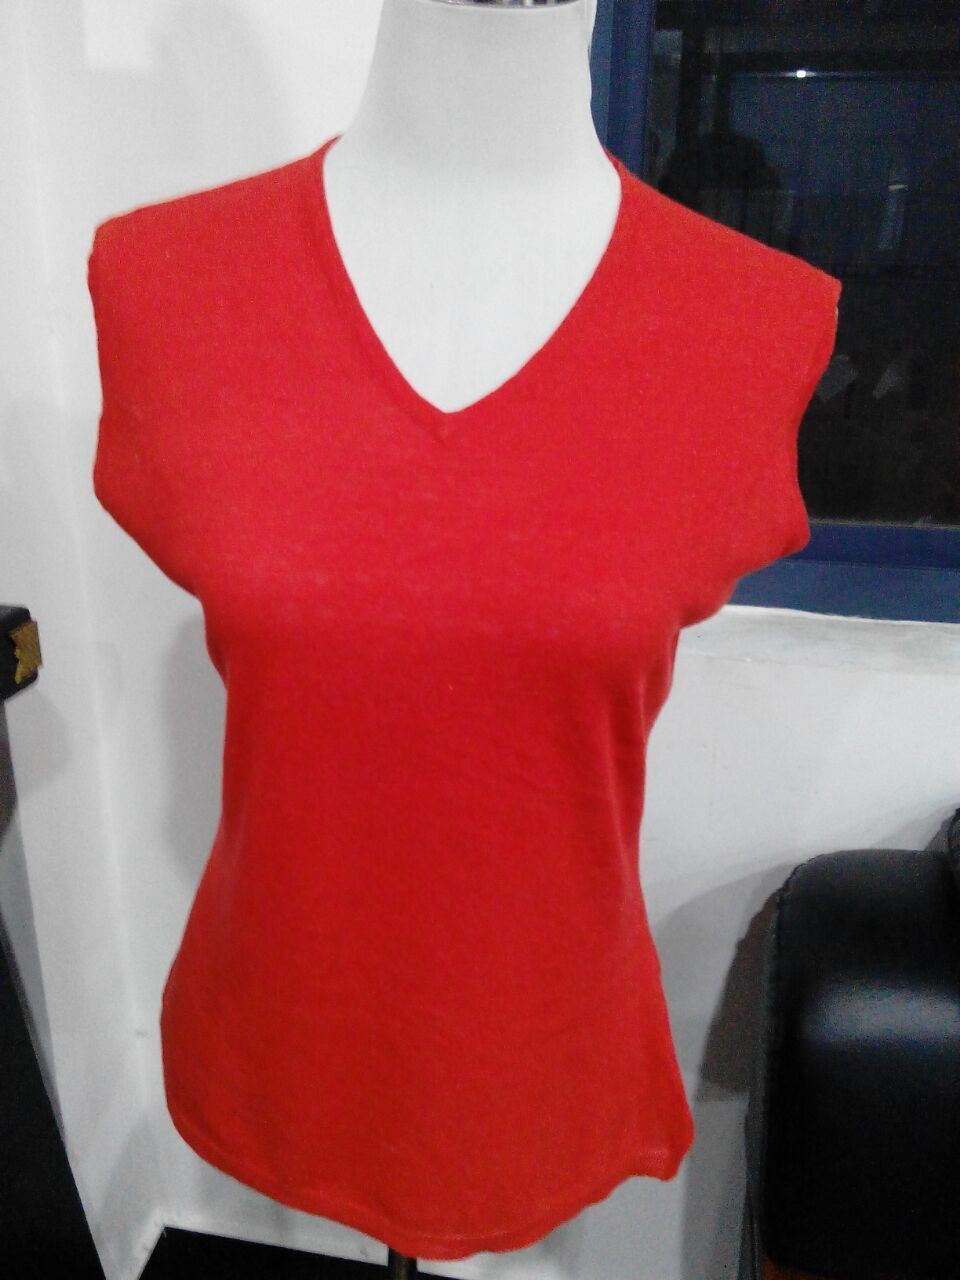 Bamboo Ladies Short Sleeve T-Shirts